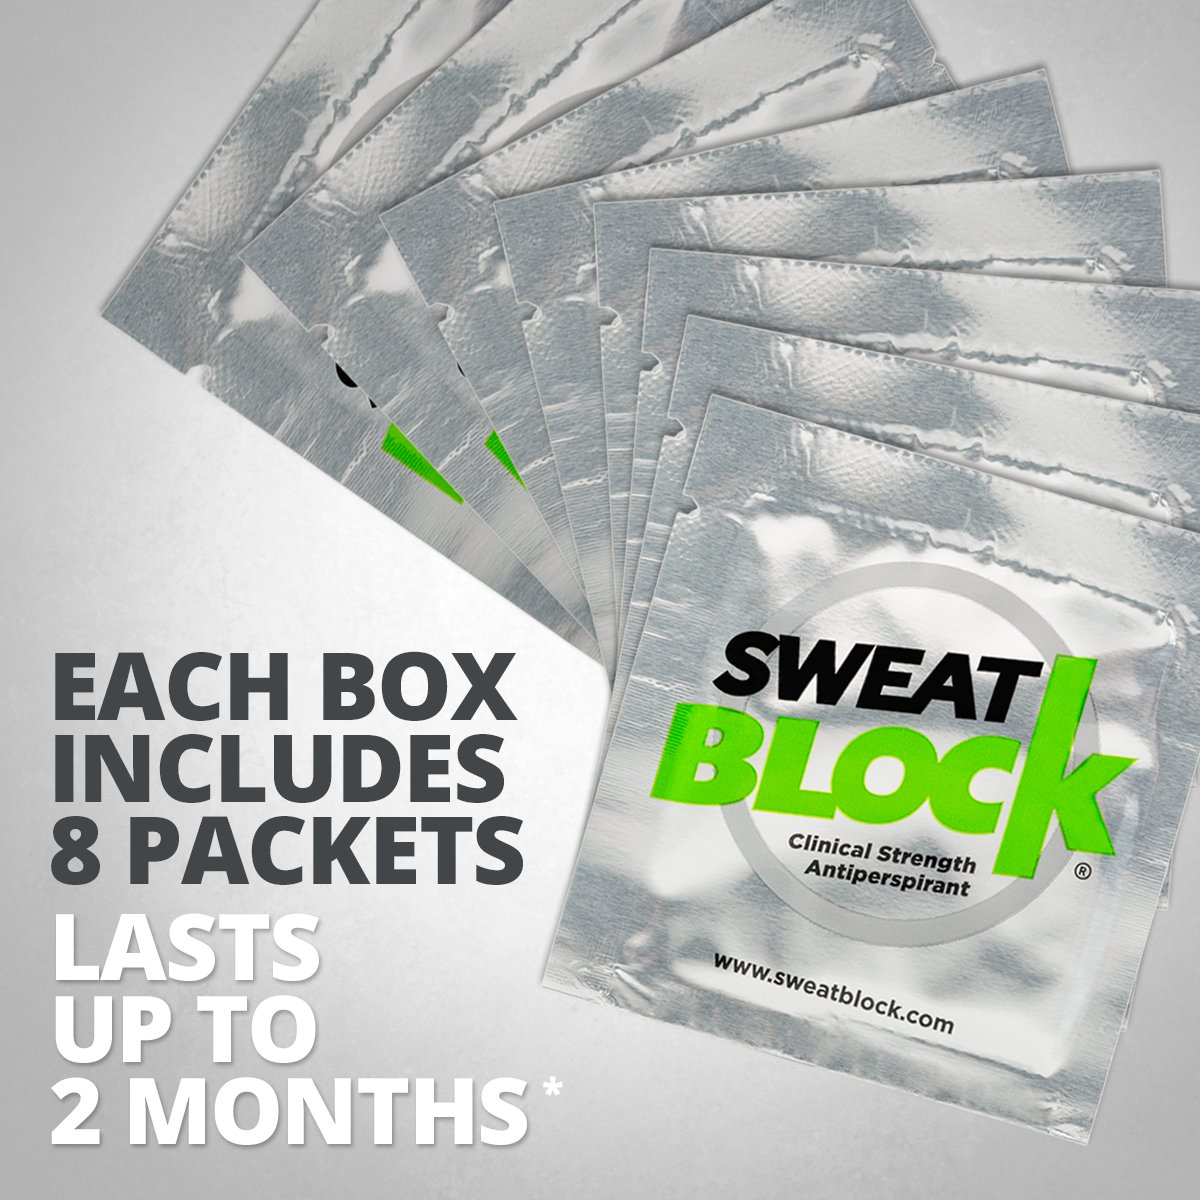 SweatBlock Antiperspirant - Clinical Strength - Reduce Sweat up to 7-days per Use by SweatBlock (Image #3)